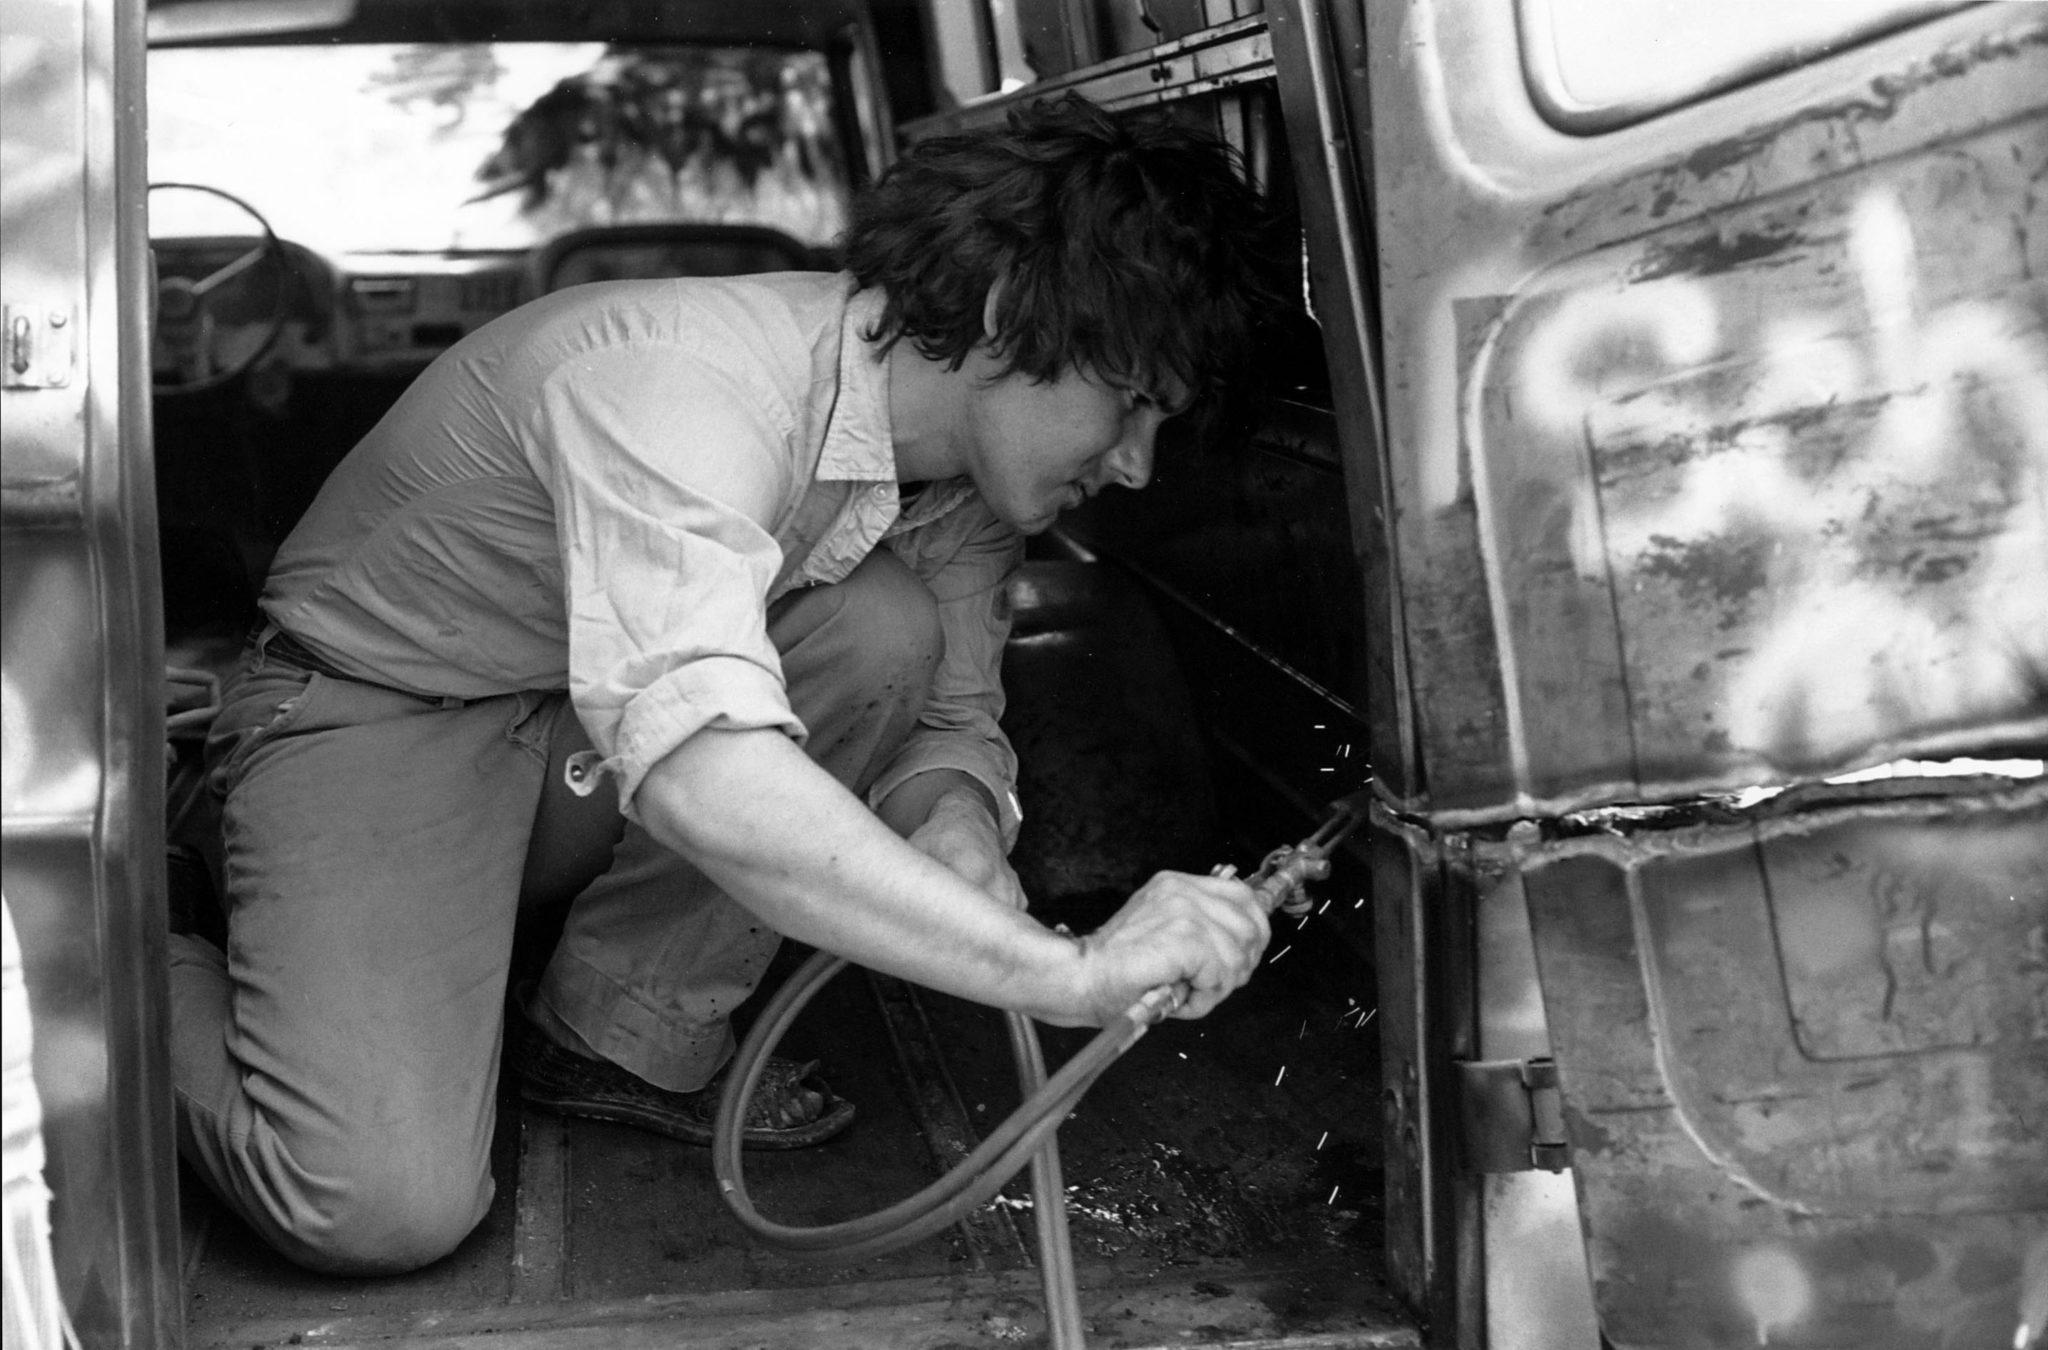 Gordon Matta-Clark découpant au chalumeau son Graffiti Truck, vers 1973 Photographe inconnu Courtesy The Estate of Gordon Matta-Clark et David Zwirner, New York / Londres / Hong Kong. © 2018 The Estate of Gordon Matta-Clark / ADAGP, Paris